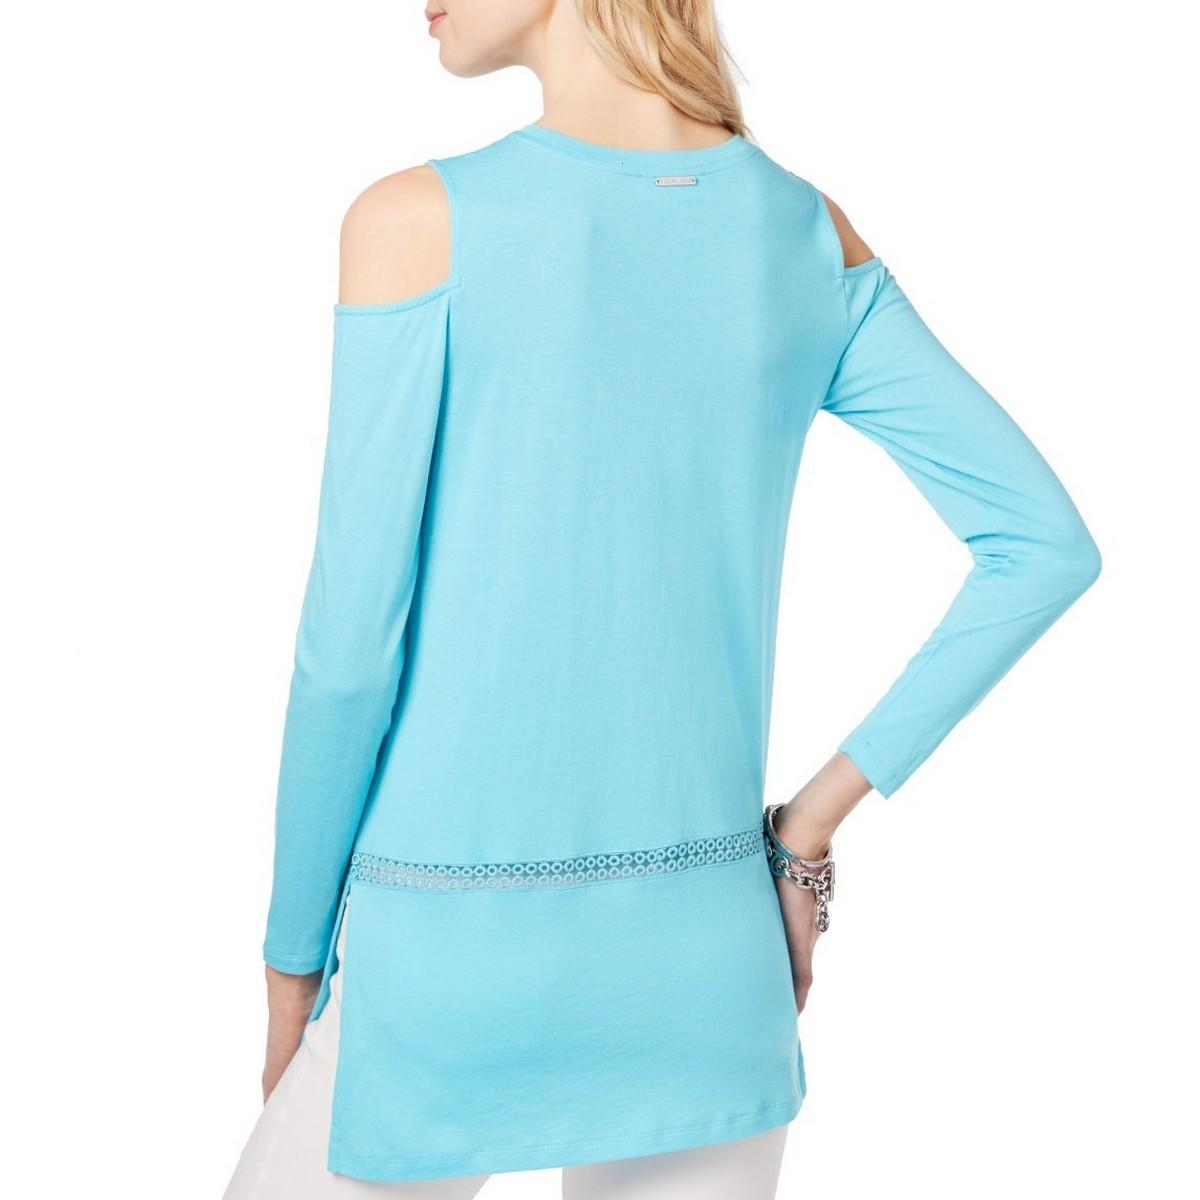 MICHAEL-KORS-NEW-Women-039-s-Turquoise-Cold-shoulder-Casual-Shirt-Top-XS-TEDO thumbnail 6